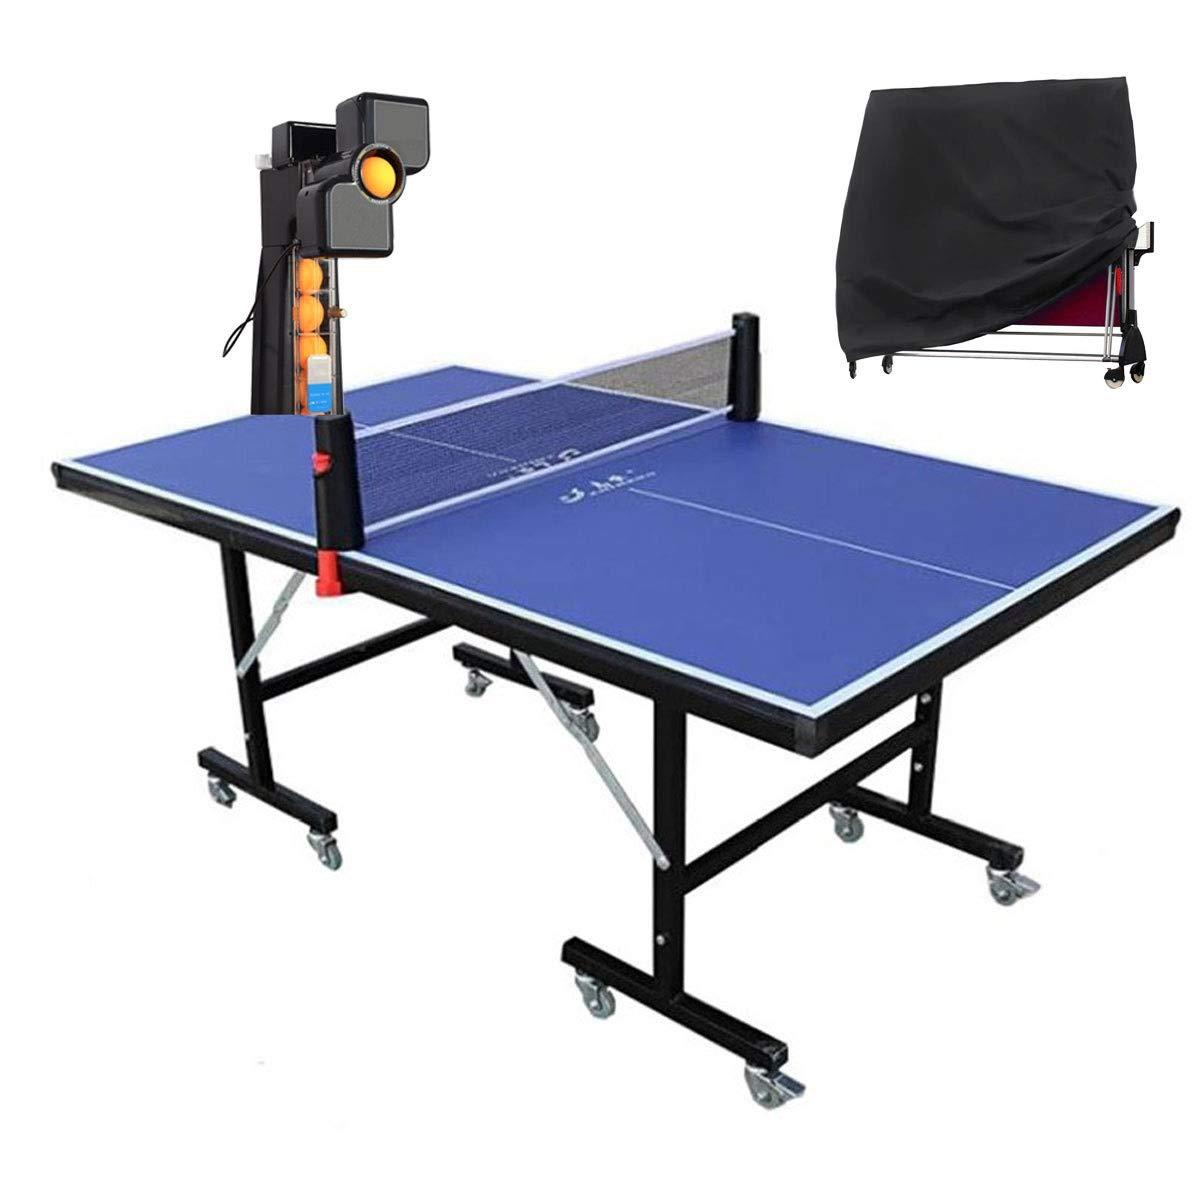 Stoge 2020 Mesa De Tenis De Mesa Al Aire Libre con Robot De Ping Pong, Juego